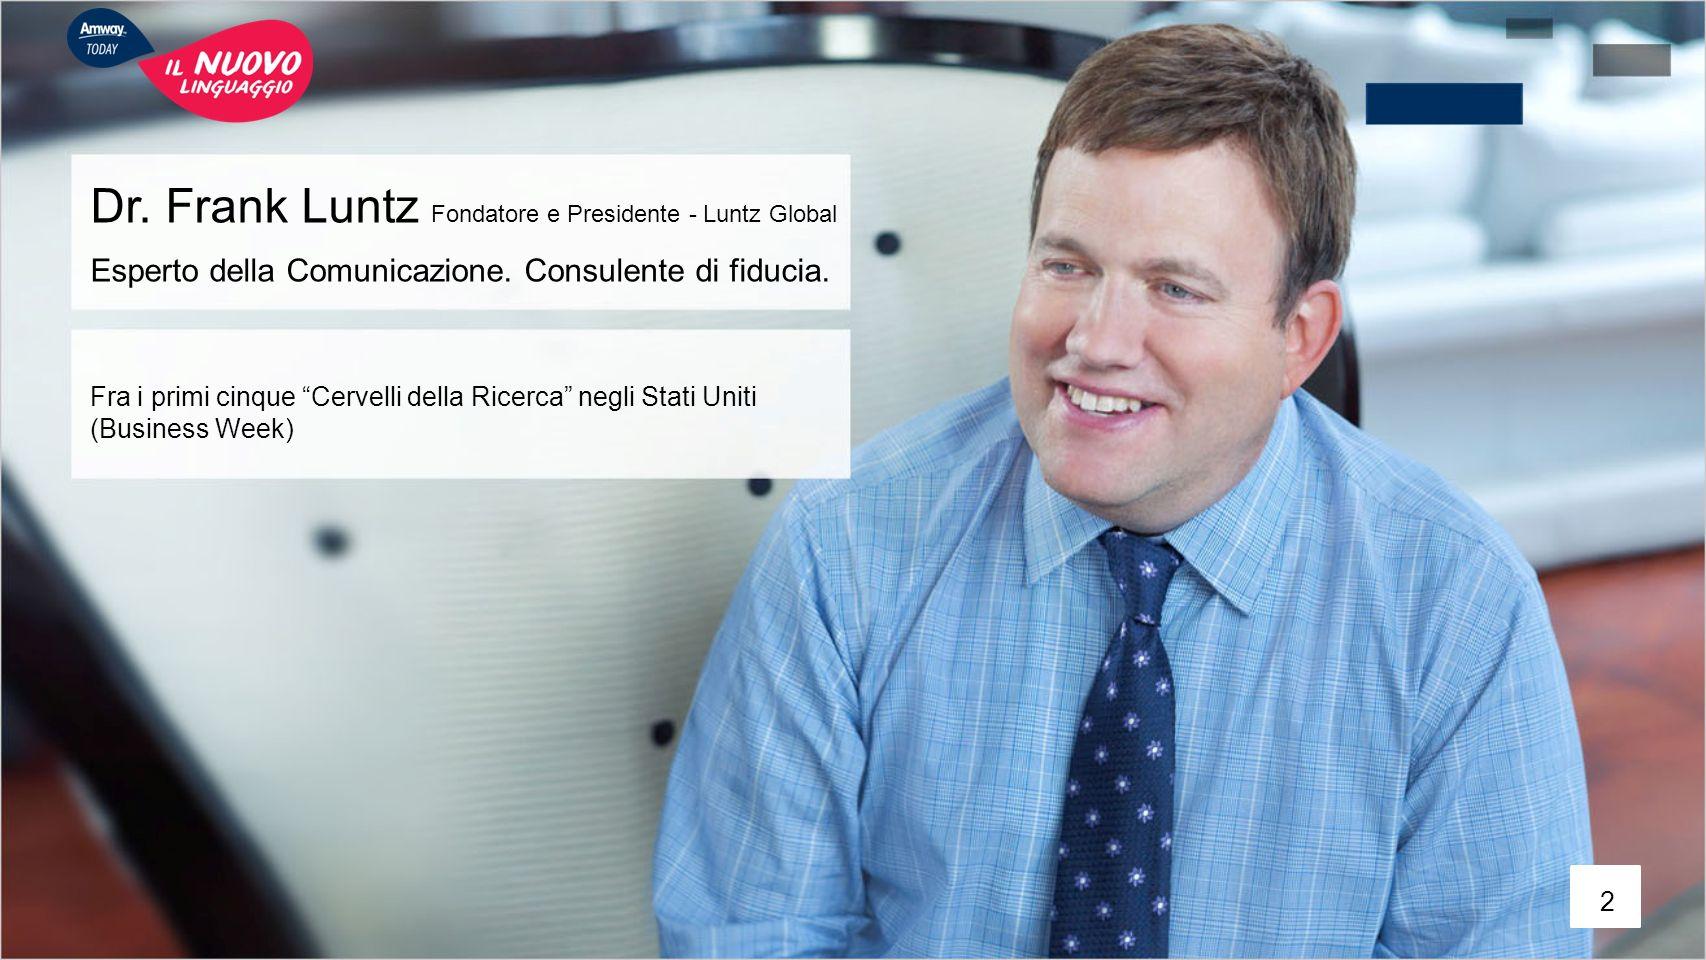 Dr. Frank Luntz Fondatore e Presidente - Luntz Global